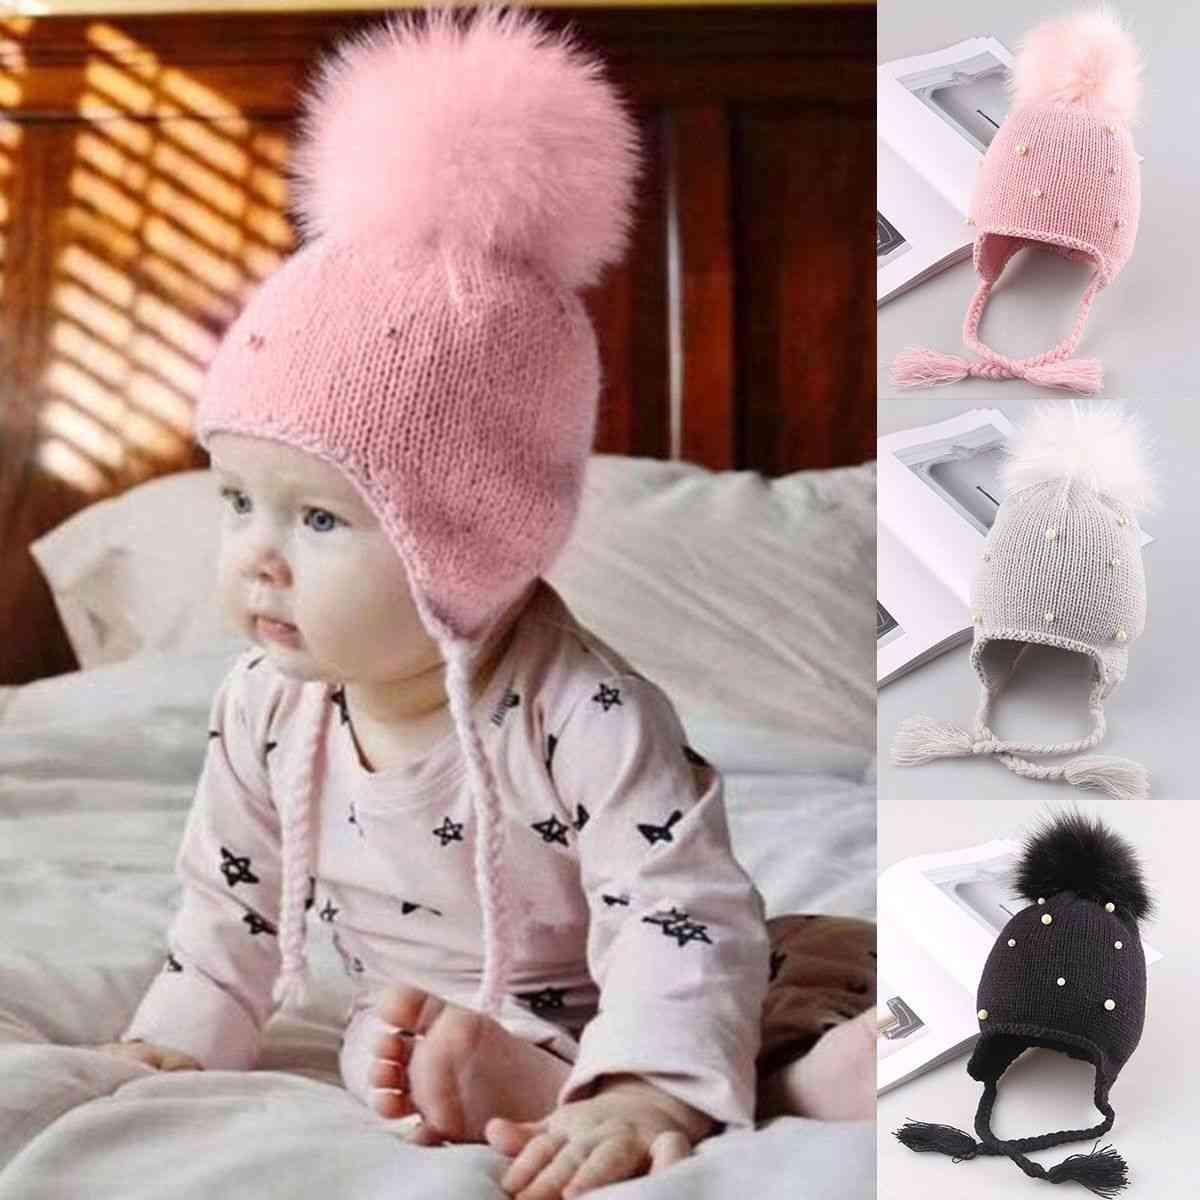 Newborn Baby Cute Pearl Hats Hair Ball, Winter Cap